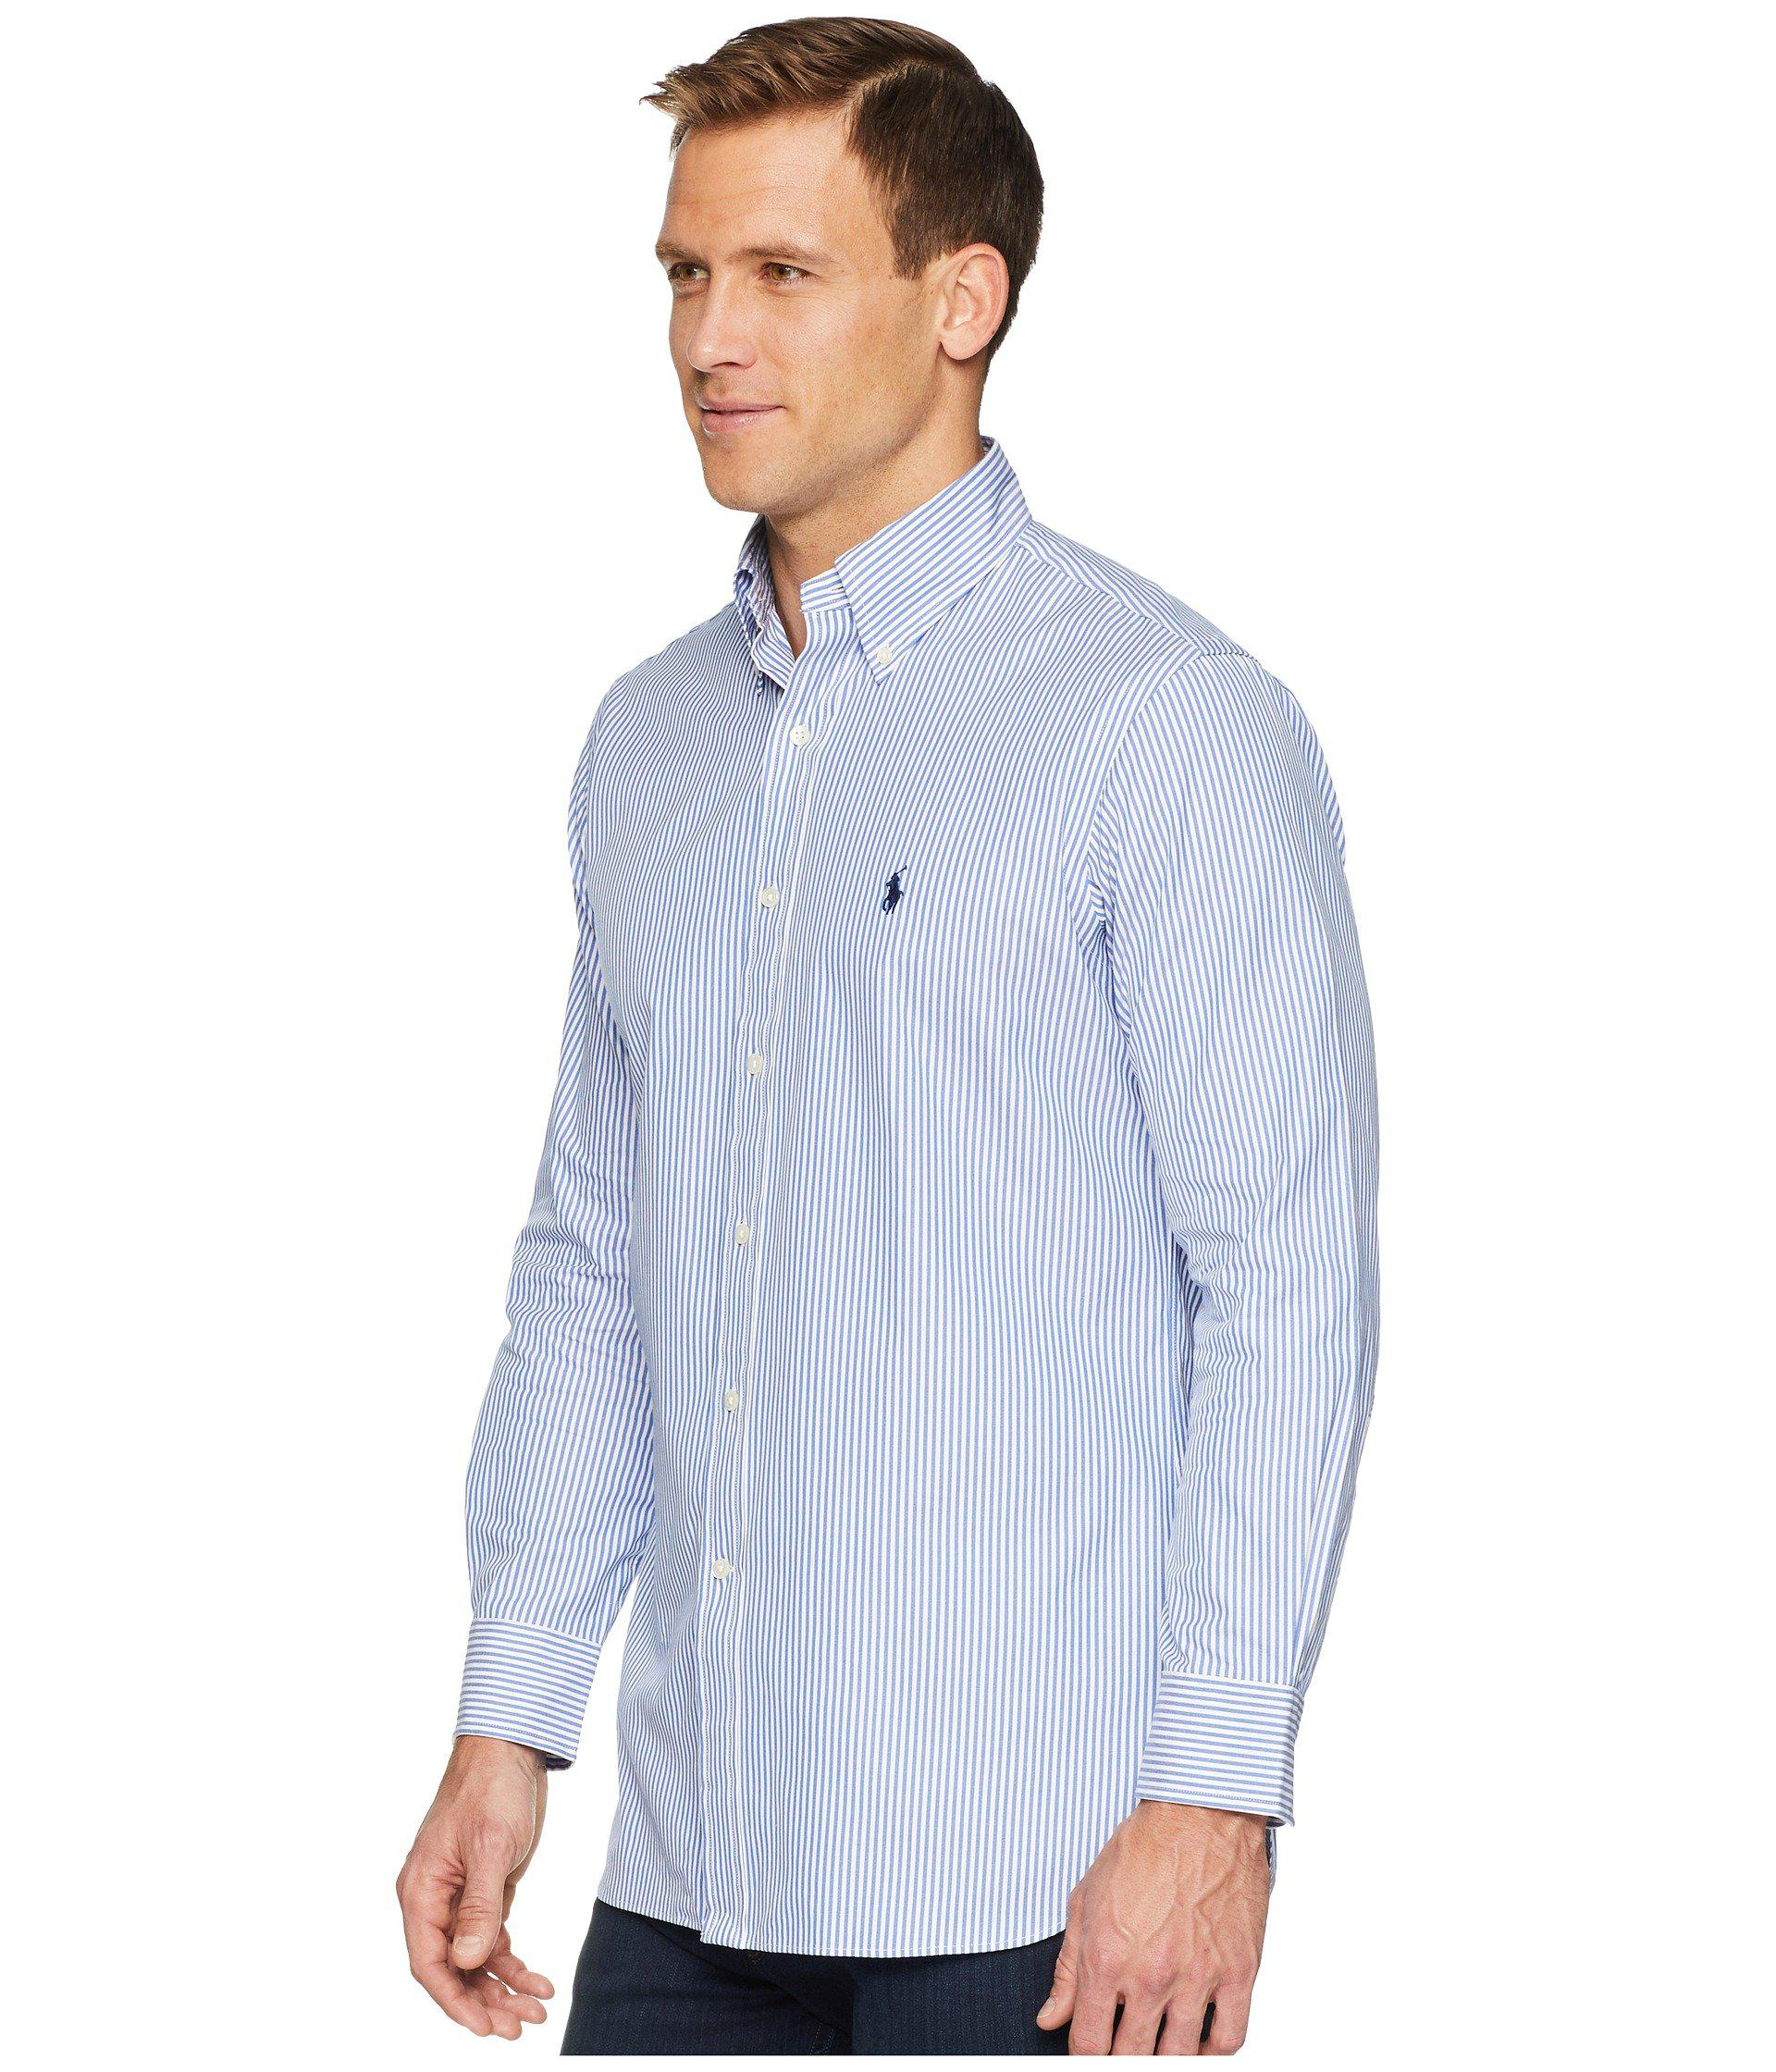 244357fa542 Lyst - Polo Ralph Lauren Standard Fit Poplin Dress Shirt (blue white  Stripe) Men s Long Sleeve Button Up in Blue for Men - Save 11%